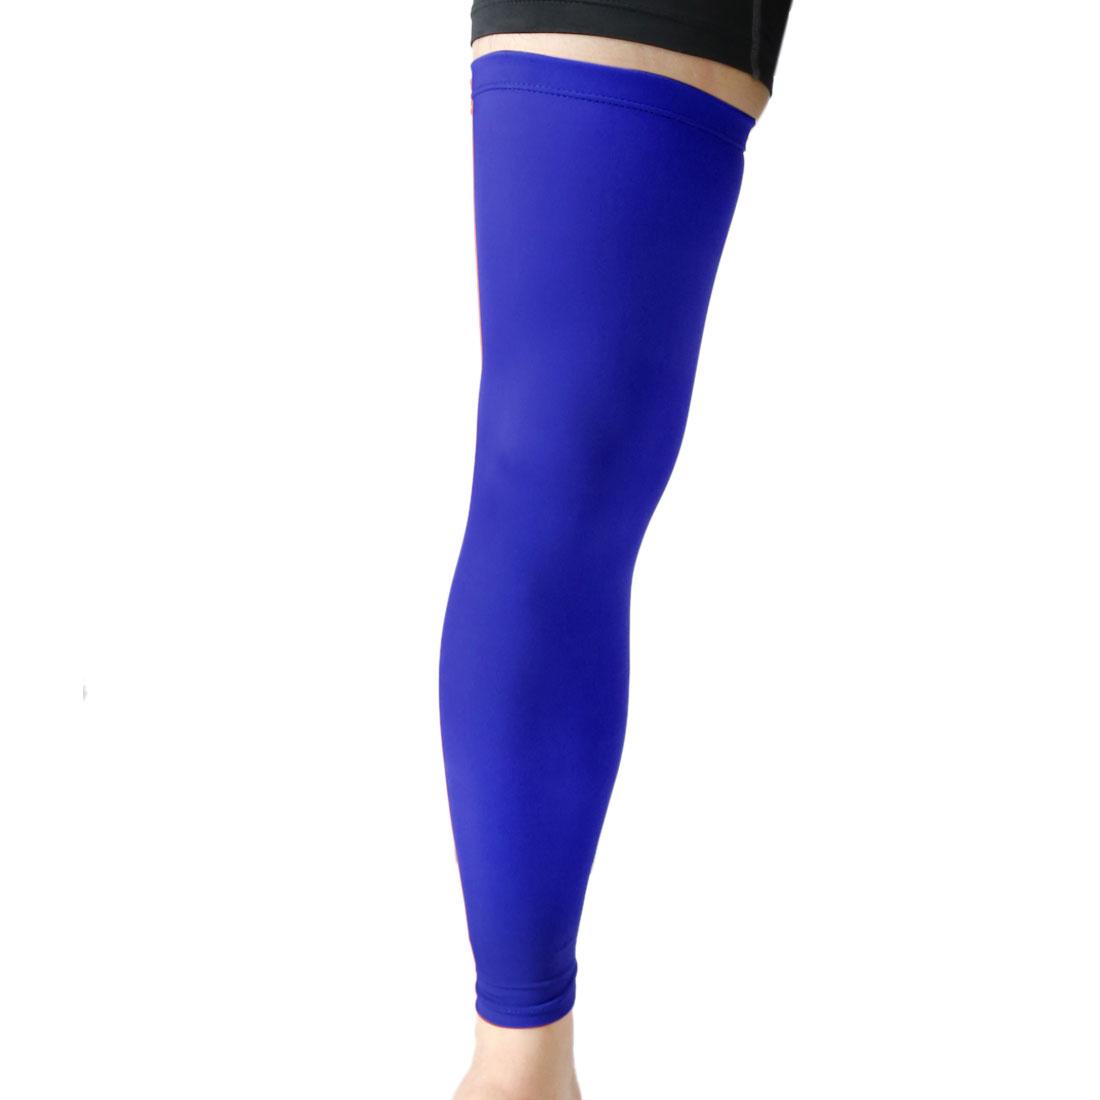 Blue XL Size Long Outdoor Sport Stretch Brace Leg Sleeve Knee Calf UV Protector - image 1 de 3